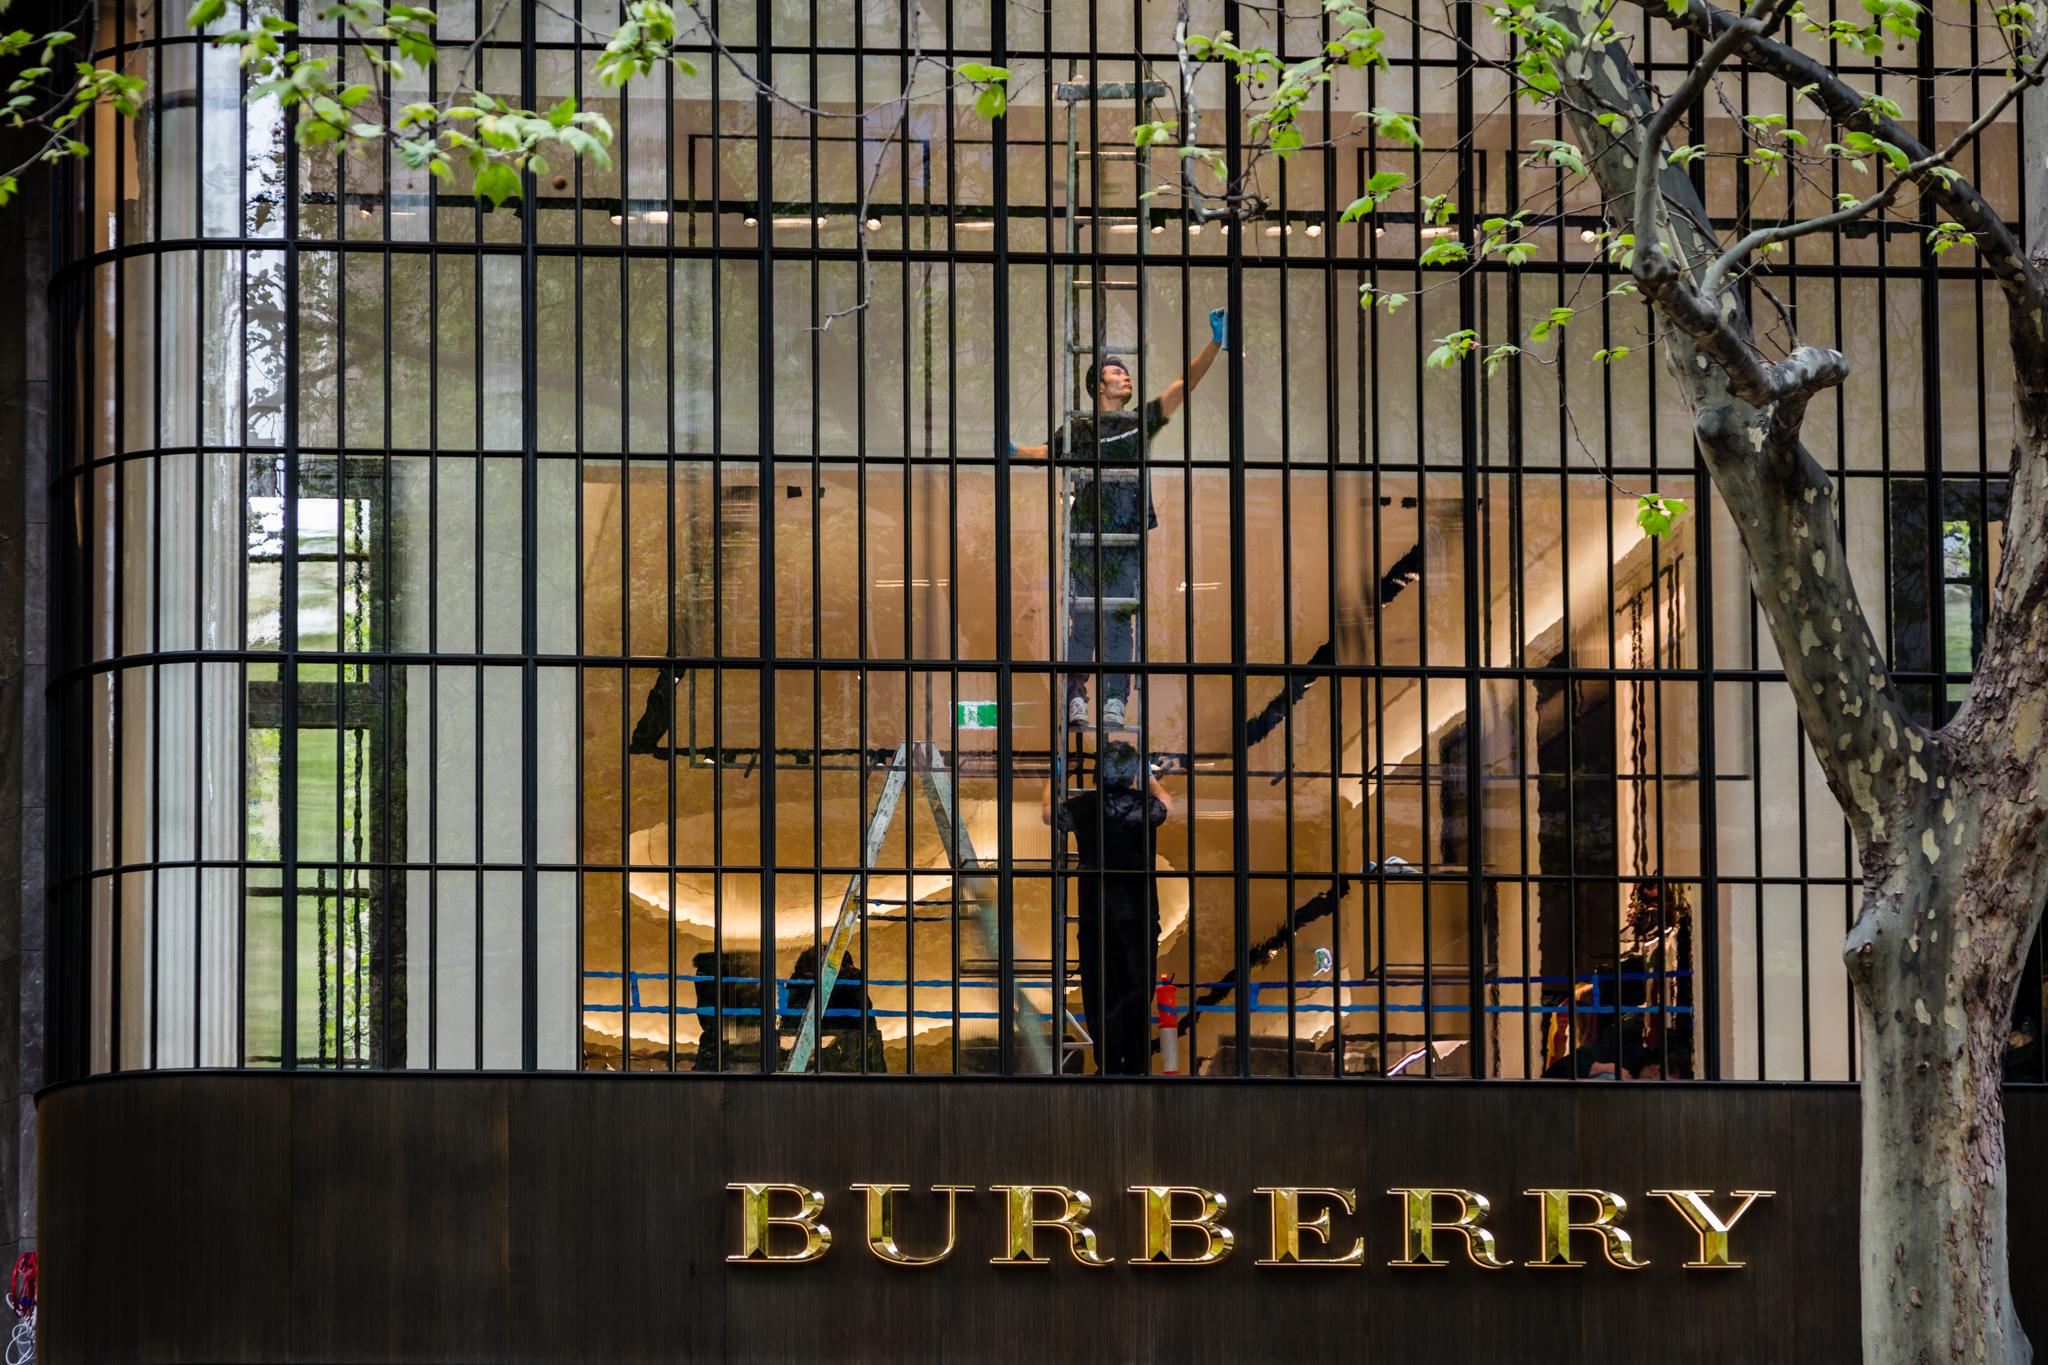 burberry-window-cleaner.jpg